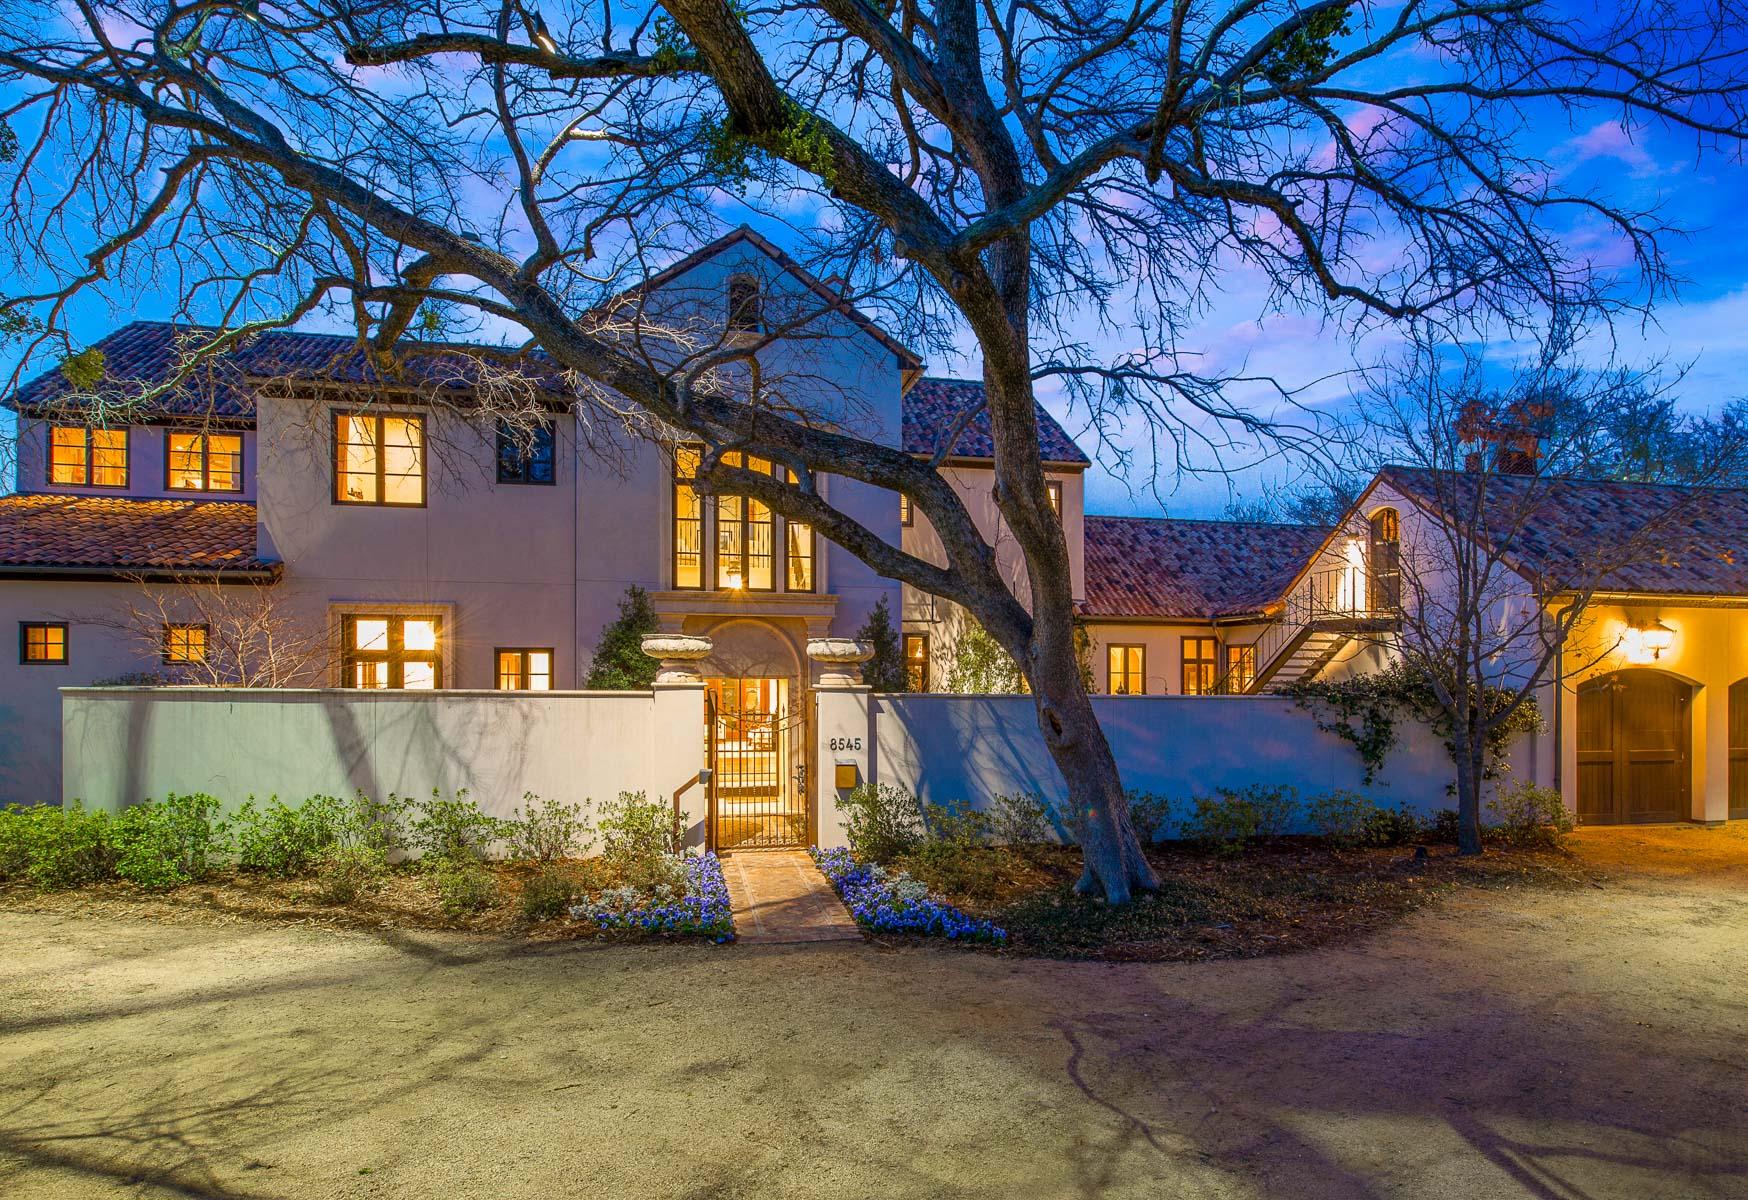 独户住宅 为 销售 在 Stunning Bluffview Estate 8545 Midway Road Dallas, 得克萨斯州 75209 美国